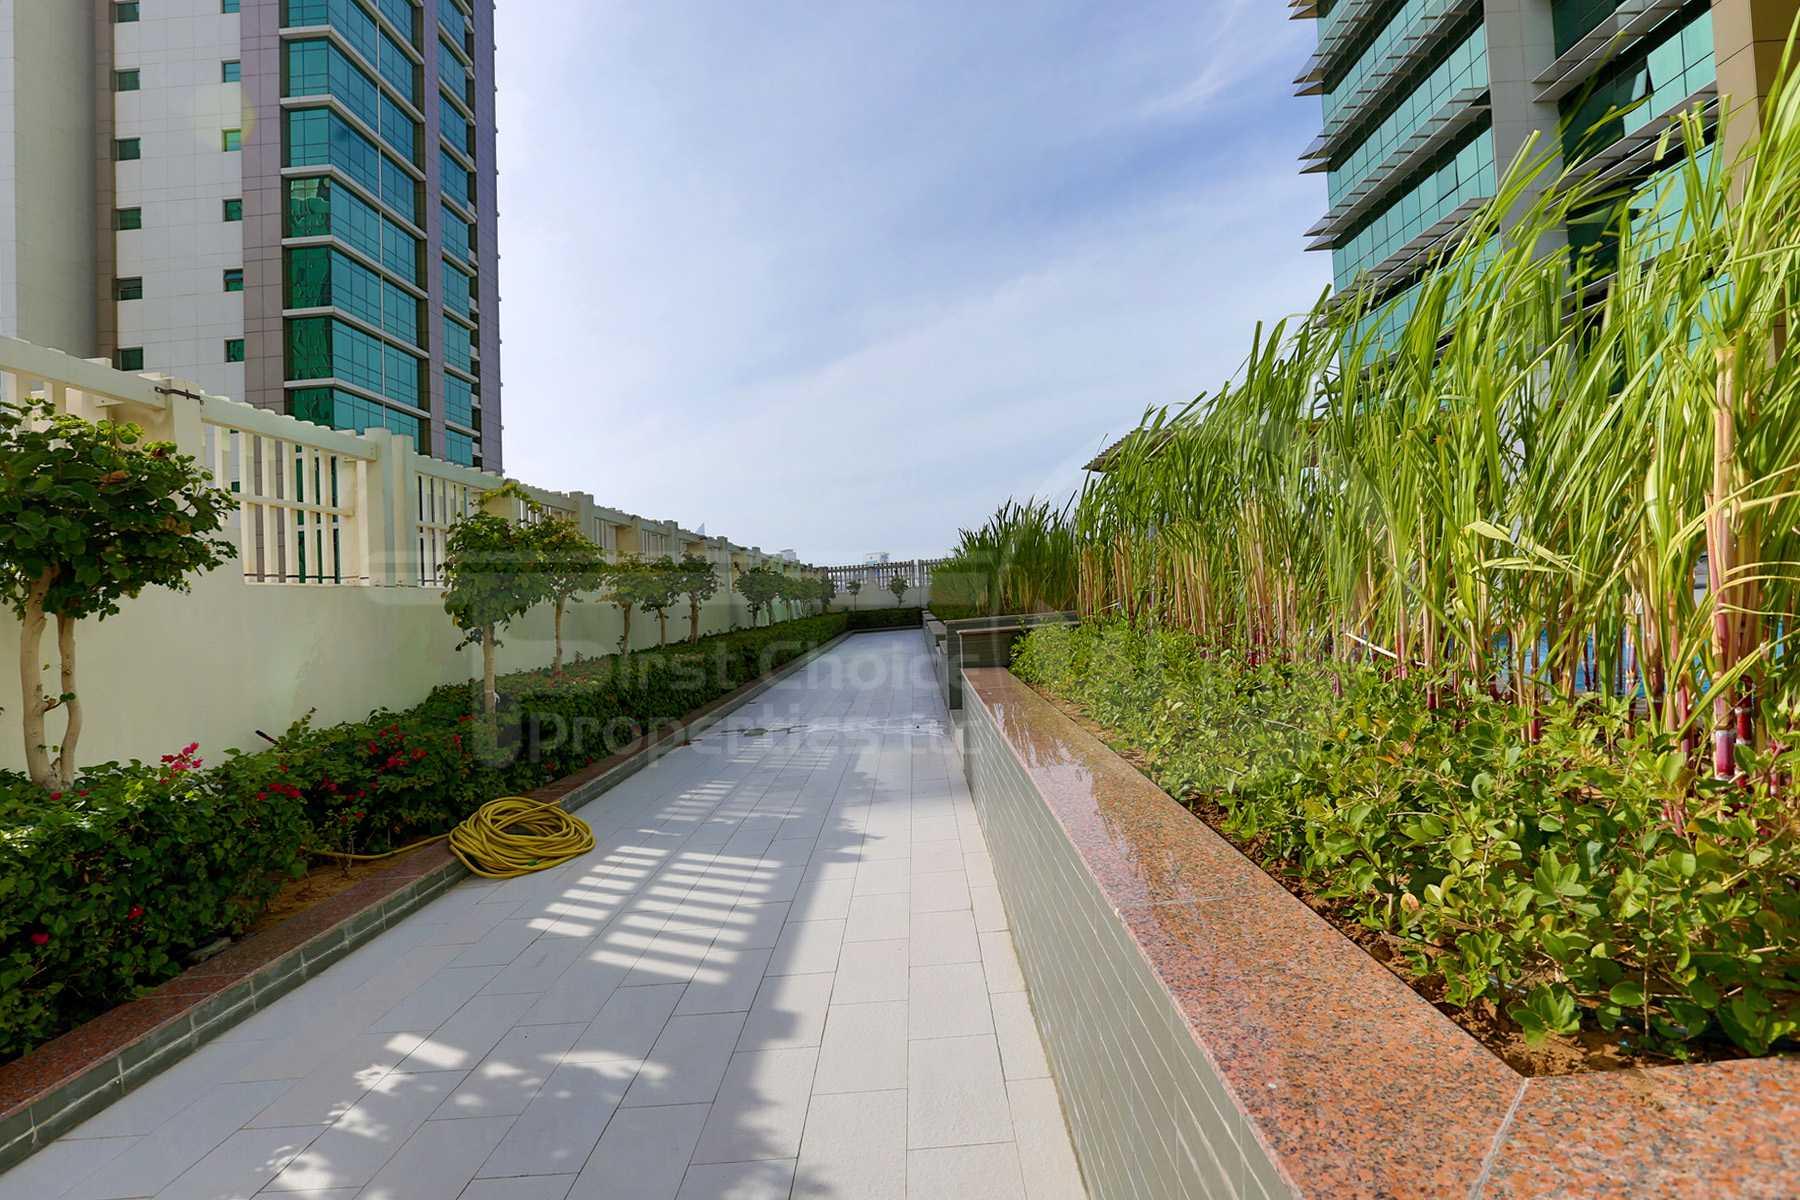 Studio - 1BR - 2BR - 3BR - 4BR Apartment - Abu Dhabi - UAE - Al Reem Island - Tala Tower - Outside View (4).jpg